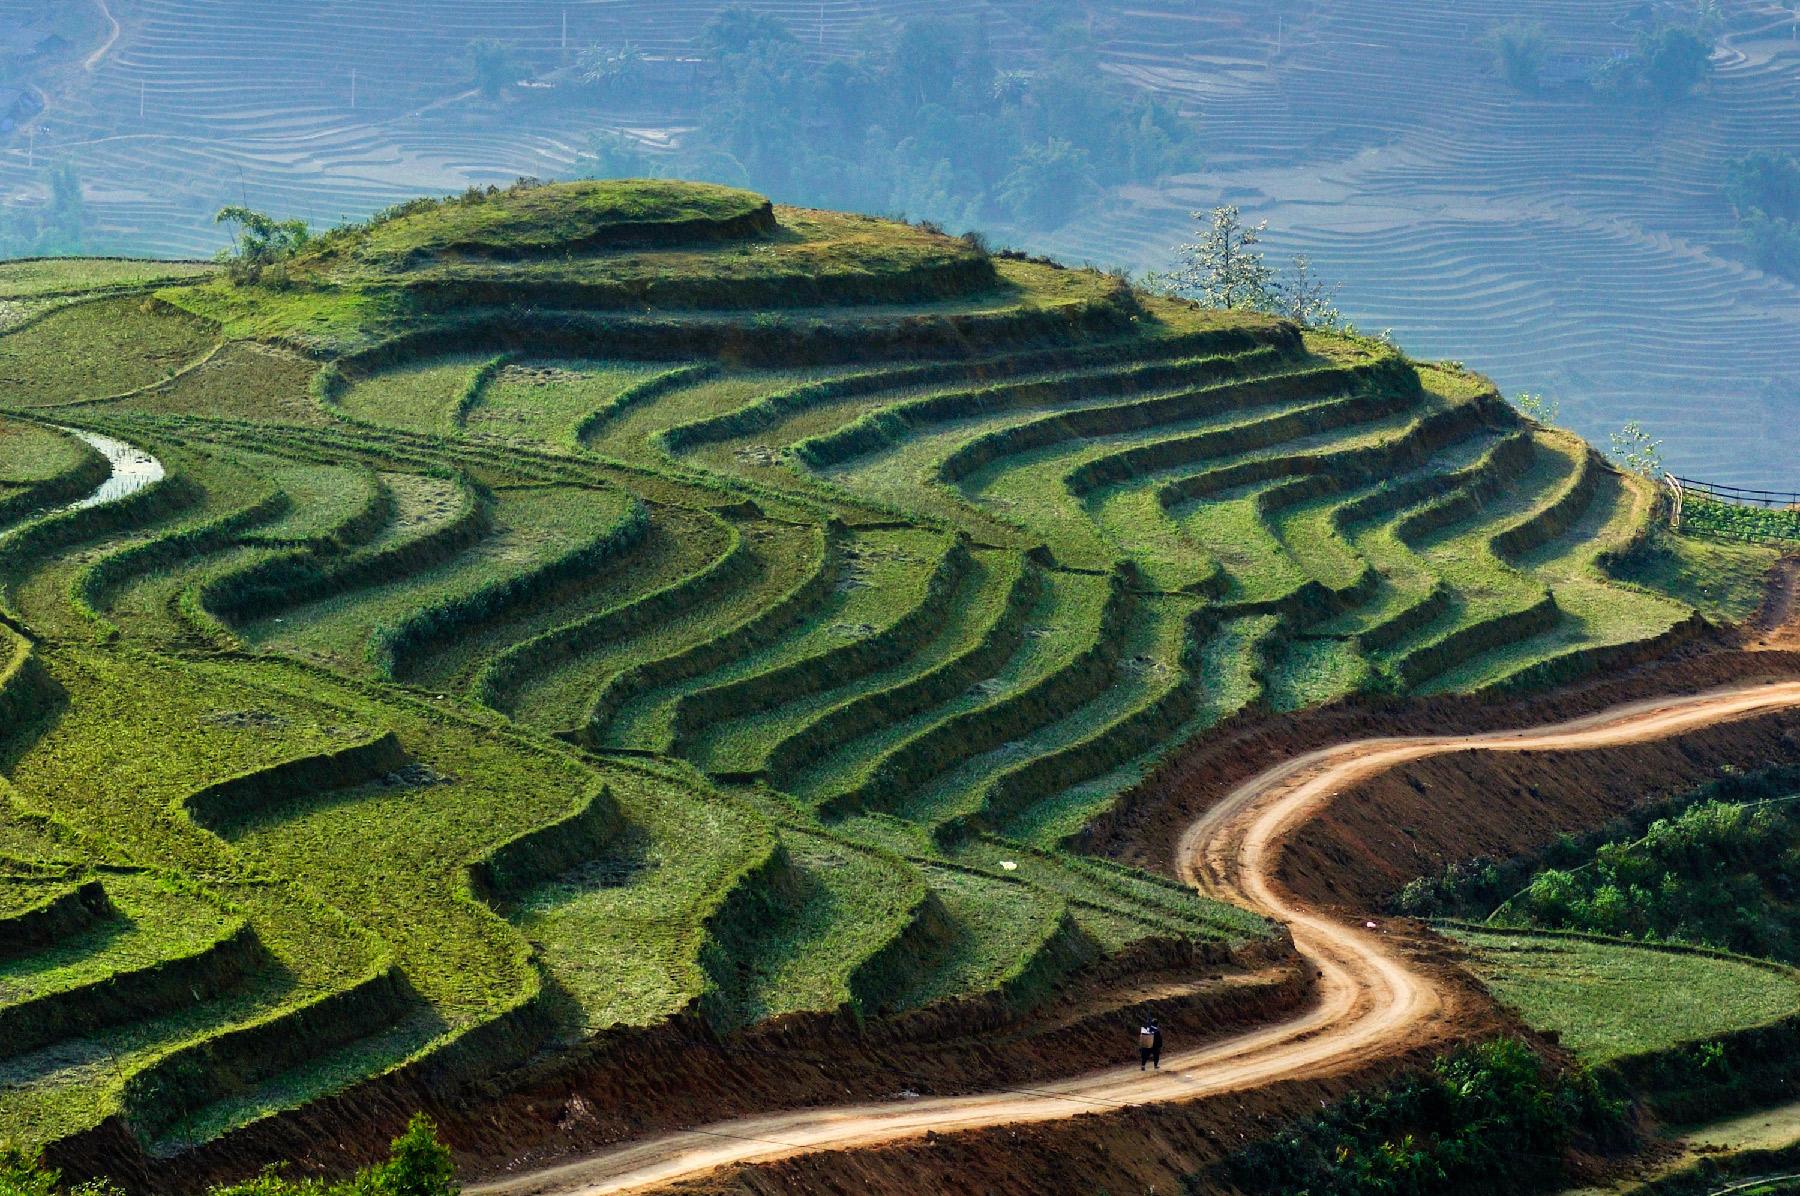 Zwerger-Schoner-Vietnam